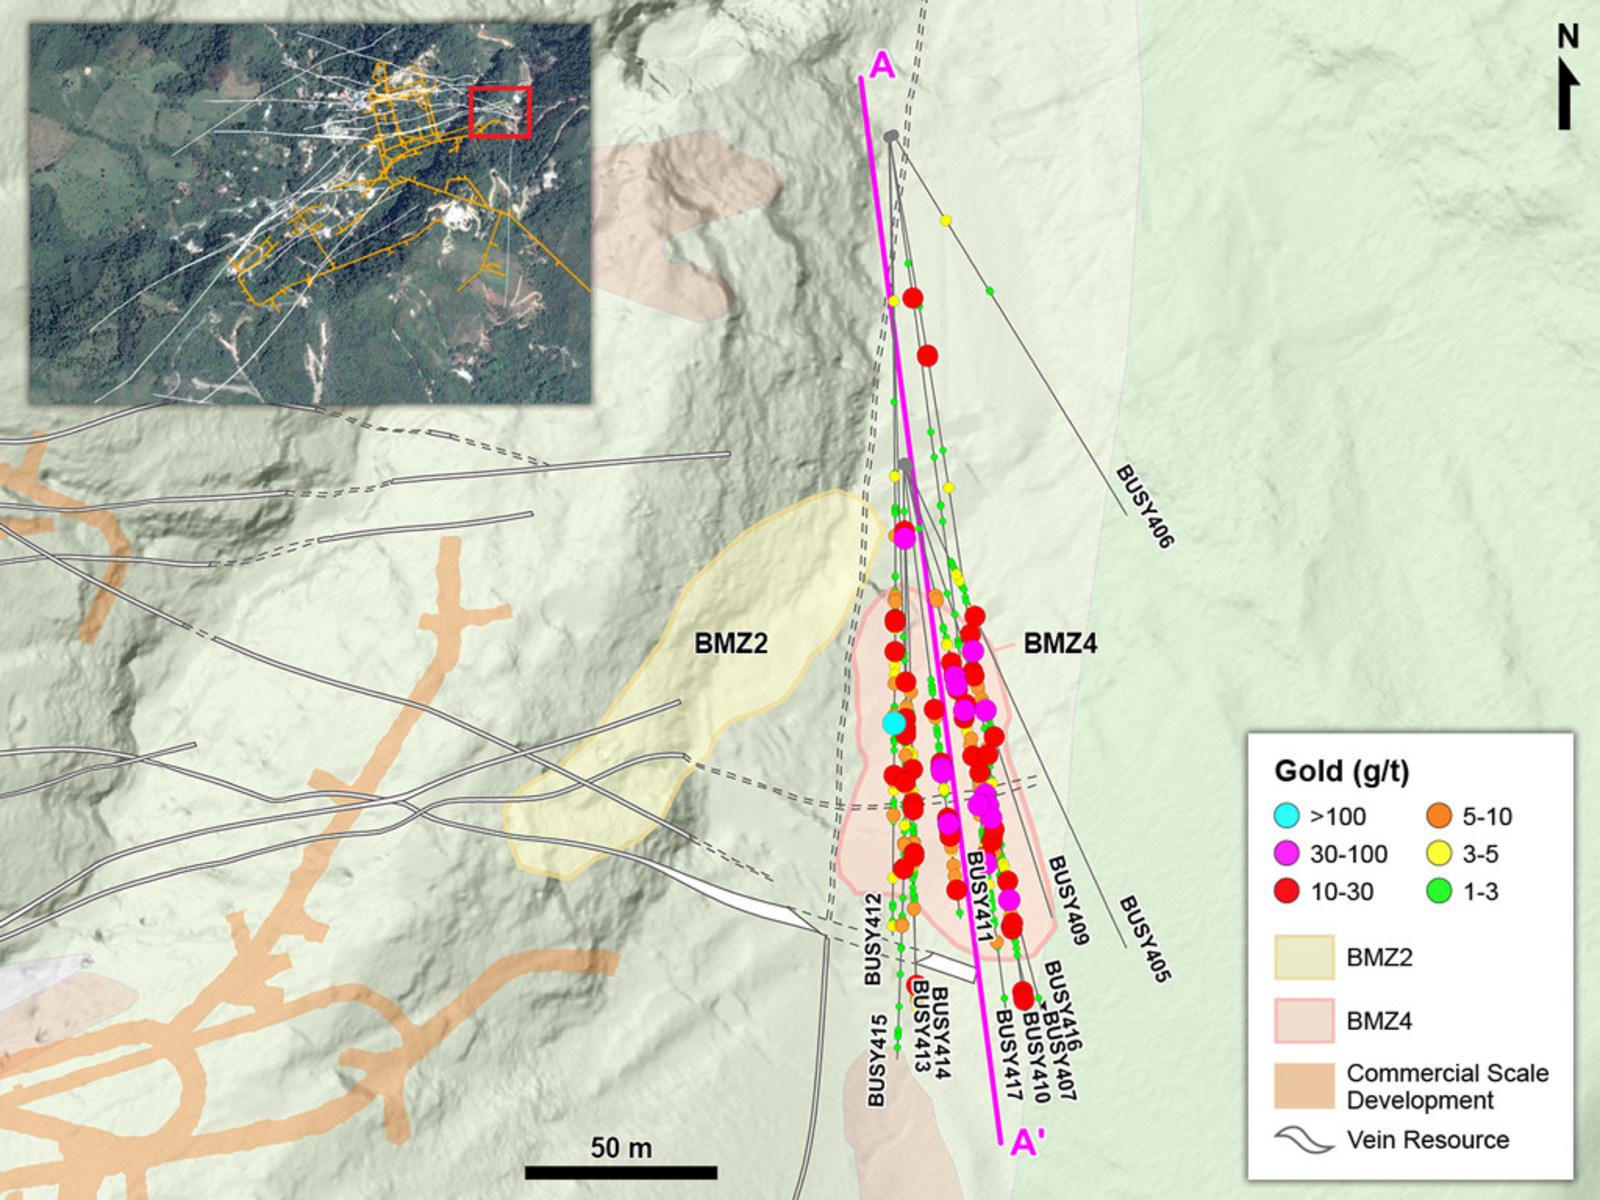 Figure 1 – Plan View of Drilling in Eastern Yaraguá System Targeting BMZ4